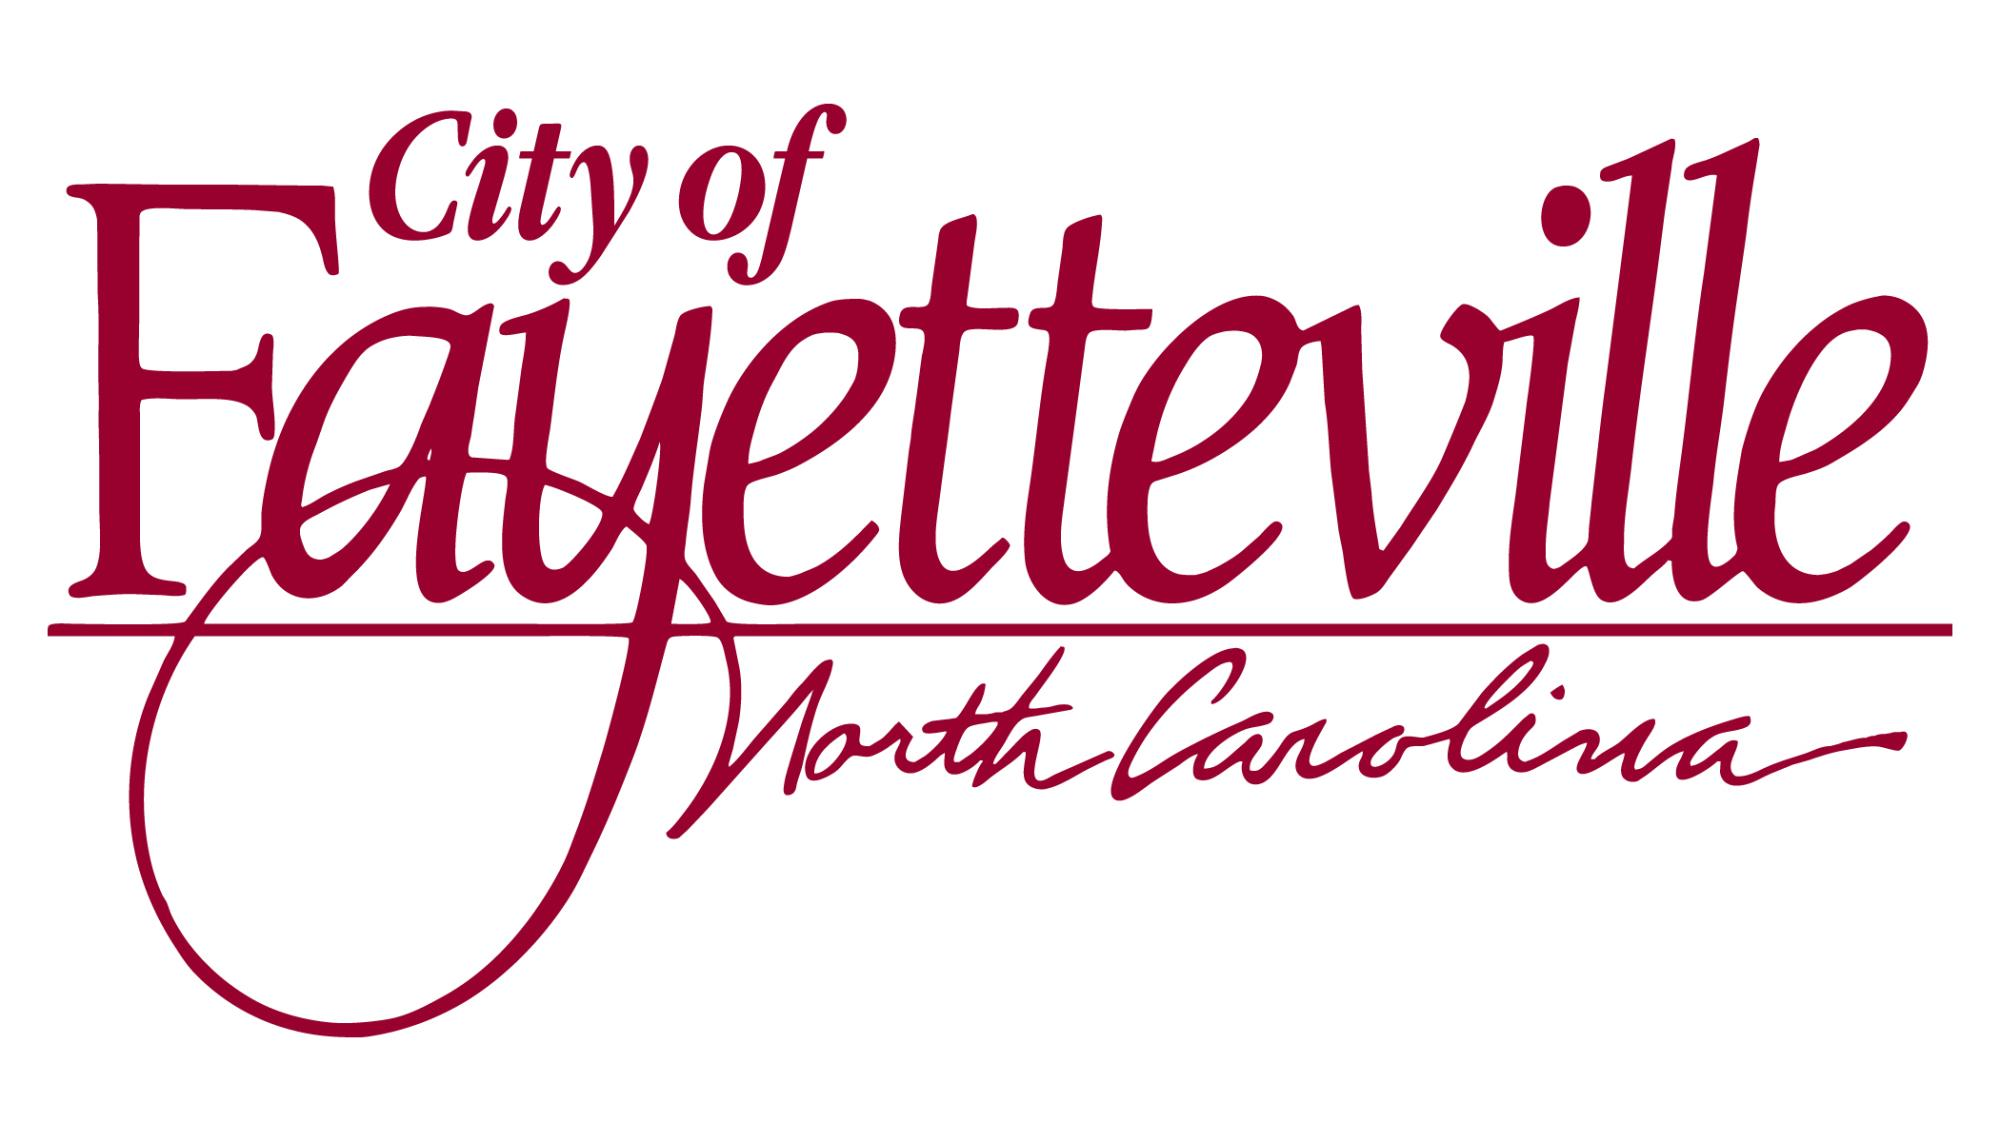 Legislative Agenda Fayetteville Nc